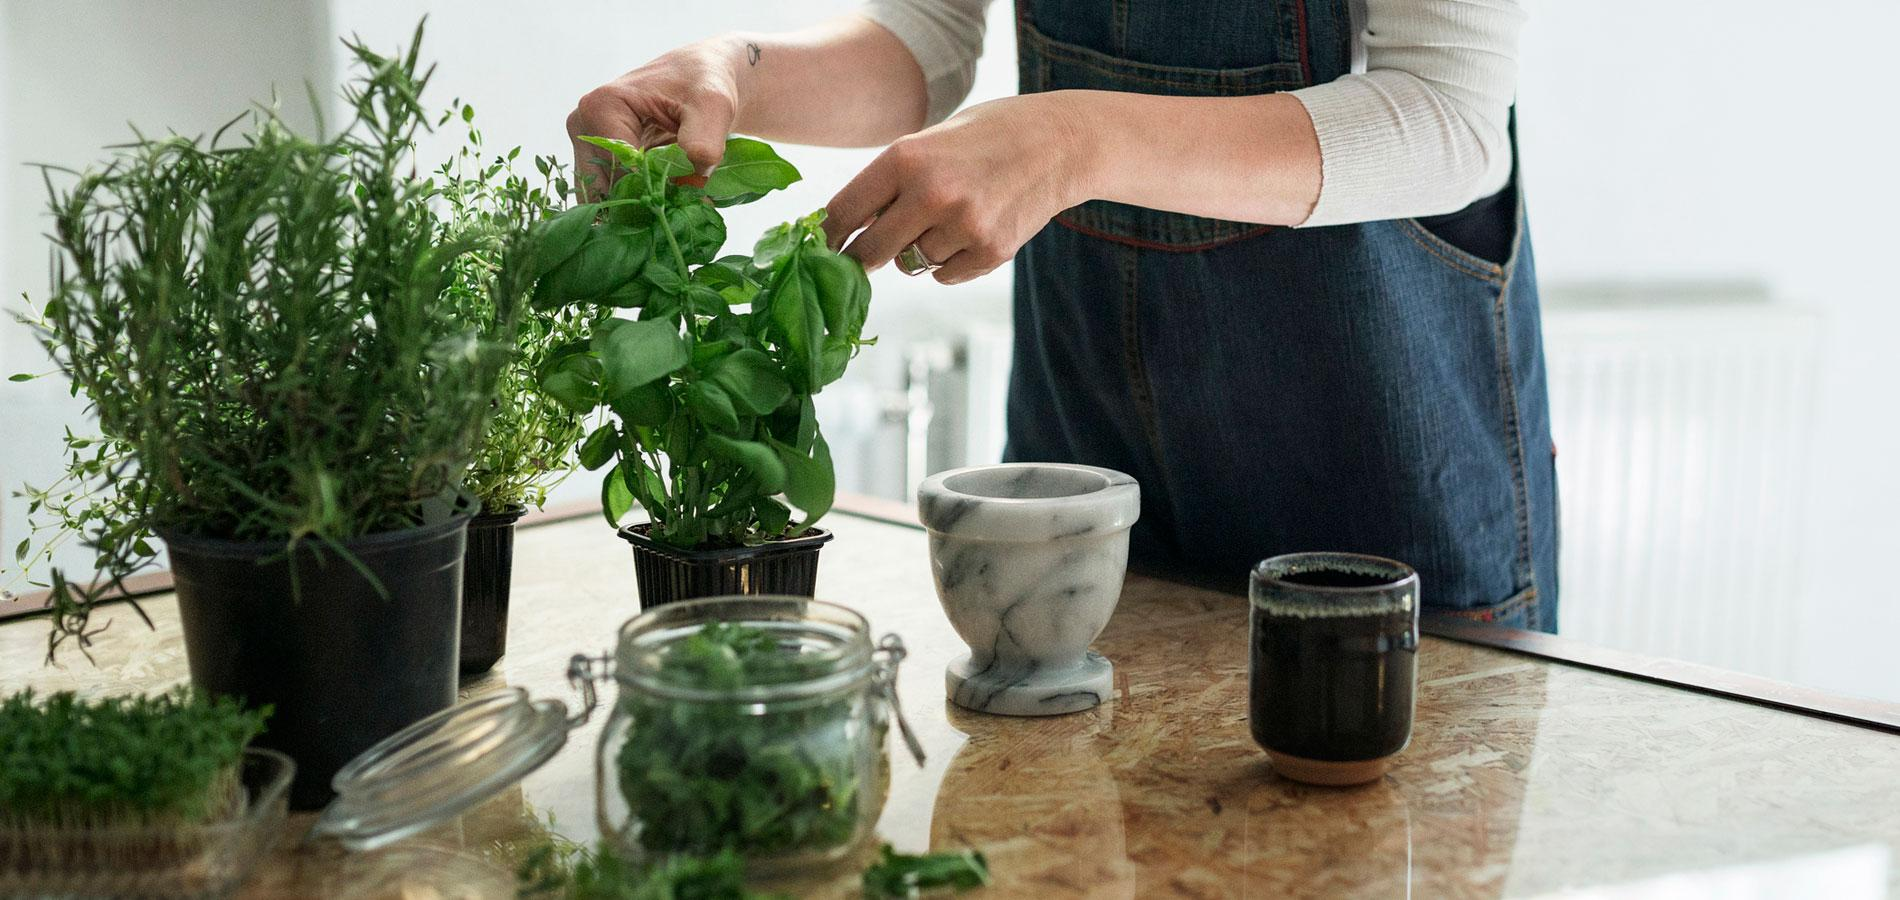 les herbes aromatiques en cuisine. Black Bedroom Furniture Sets. Home Design Ideas